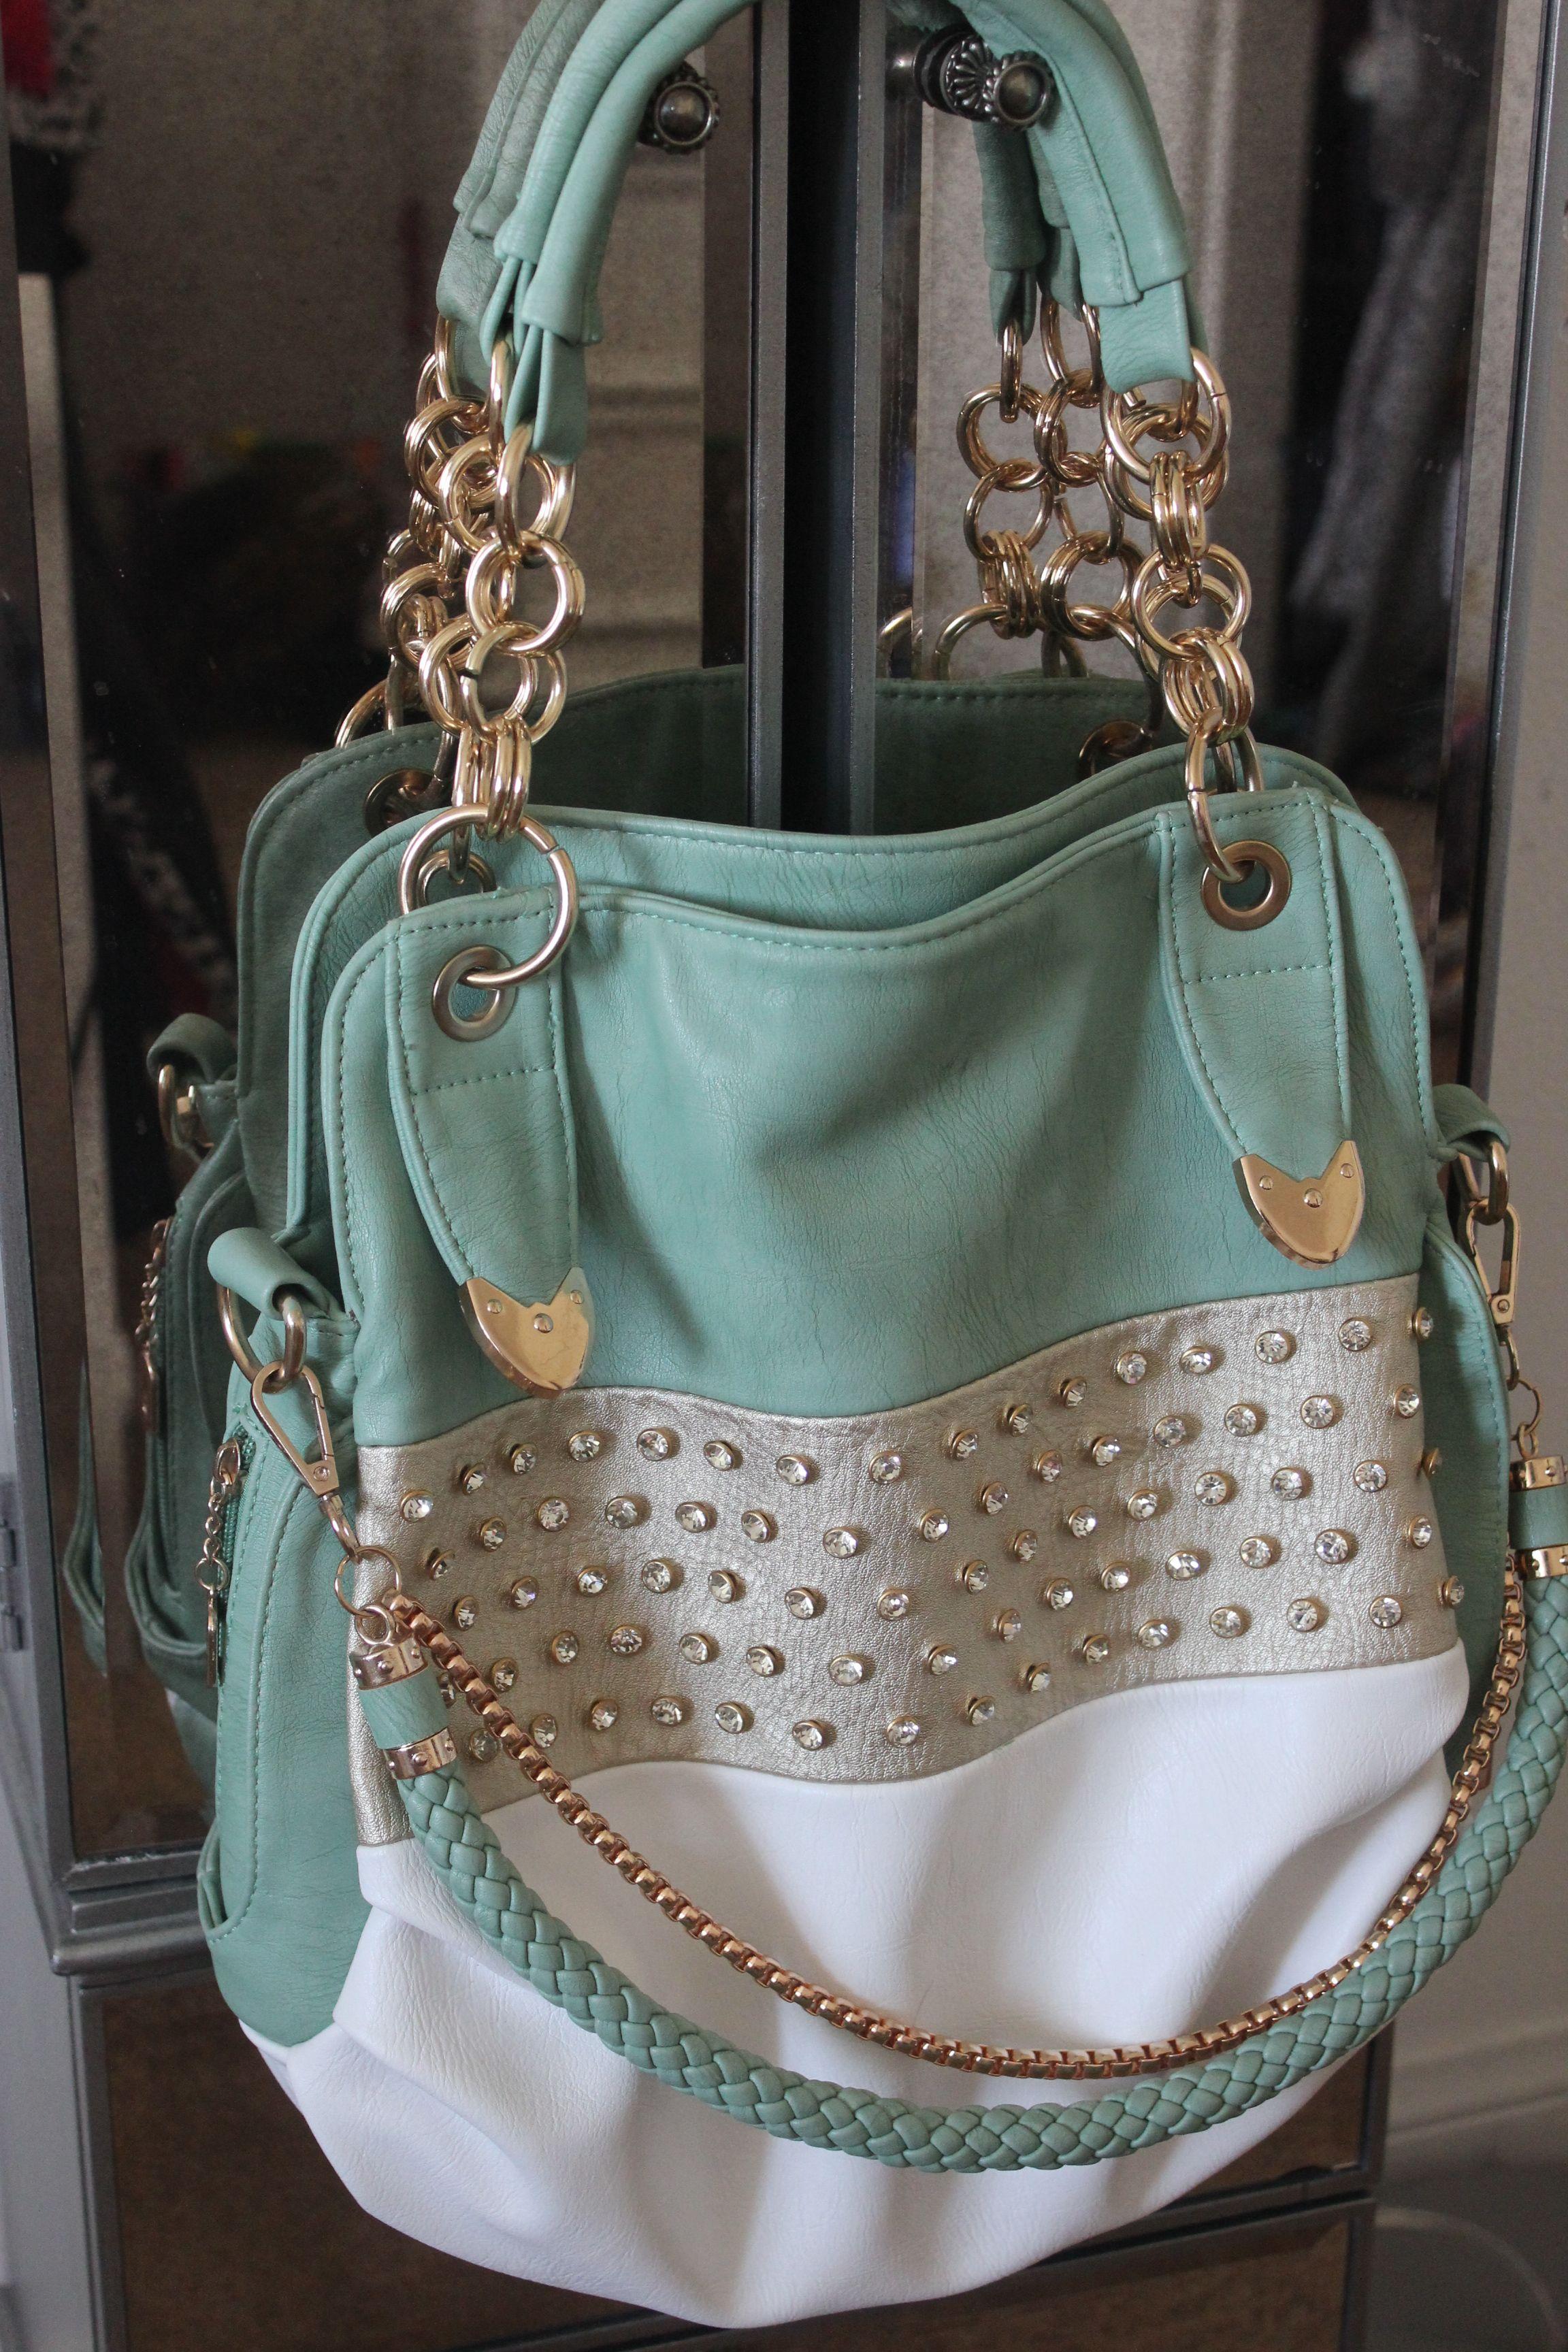 Pin by Nicole Barnes on Cute bags | Handbag accessories ...